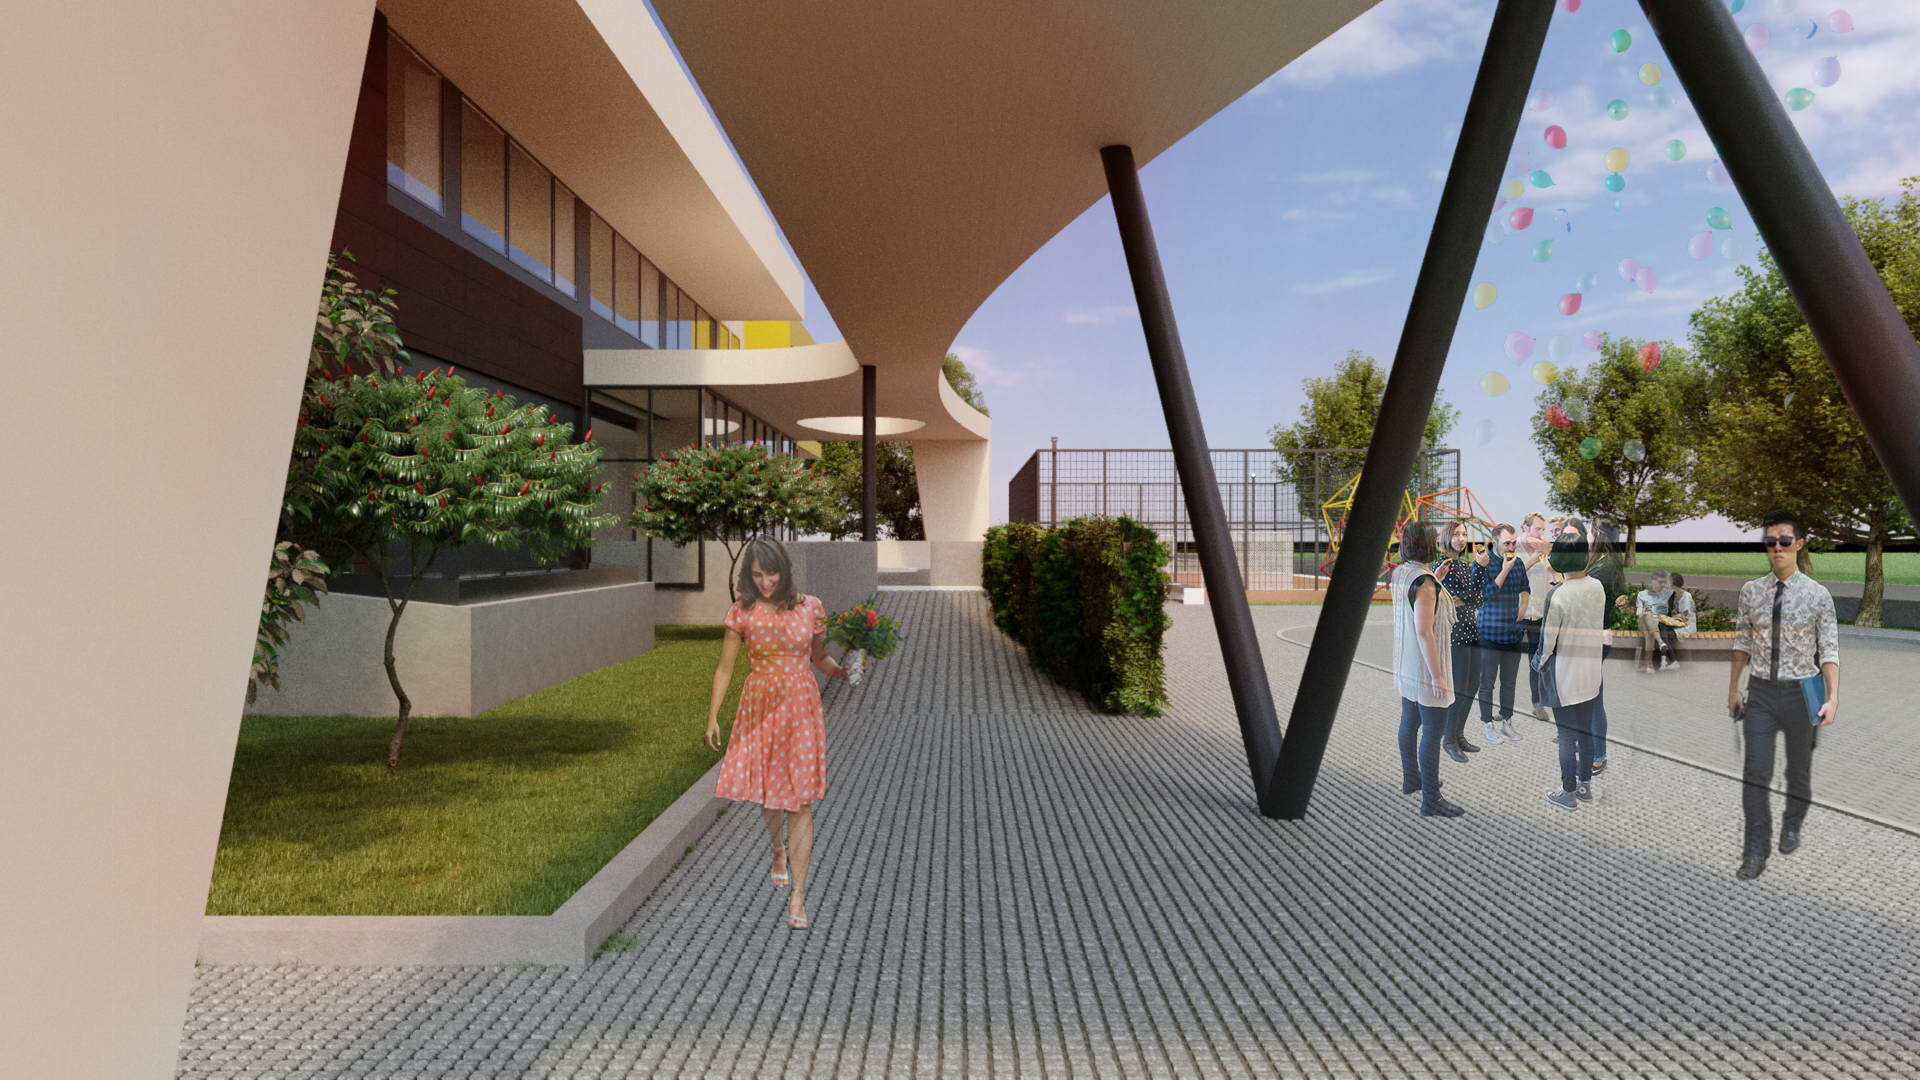 https://nbc-arhitect.ro/wp-content/uploads/2020/10/NBC-Arhitect-_-public-buildings-_-Olga-Gudynn-Intl-School-Bucharest-_-Bucharest-Romania_3.jpg